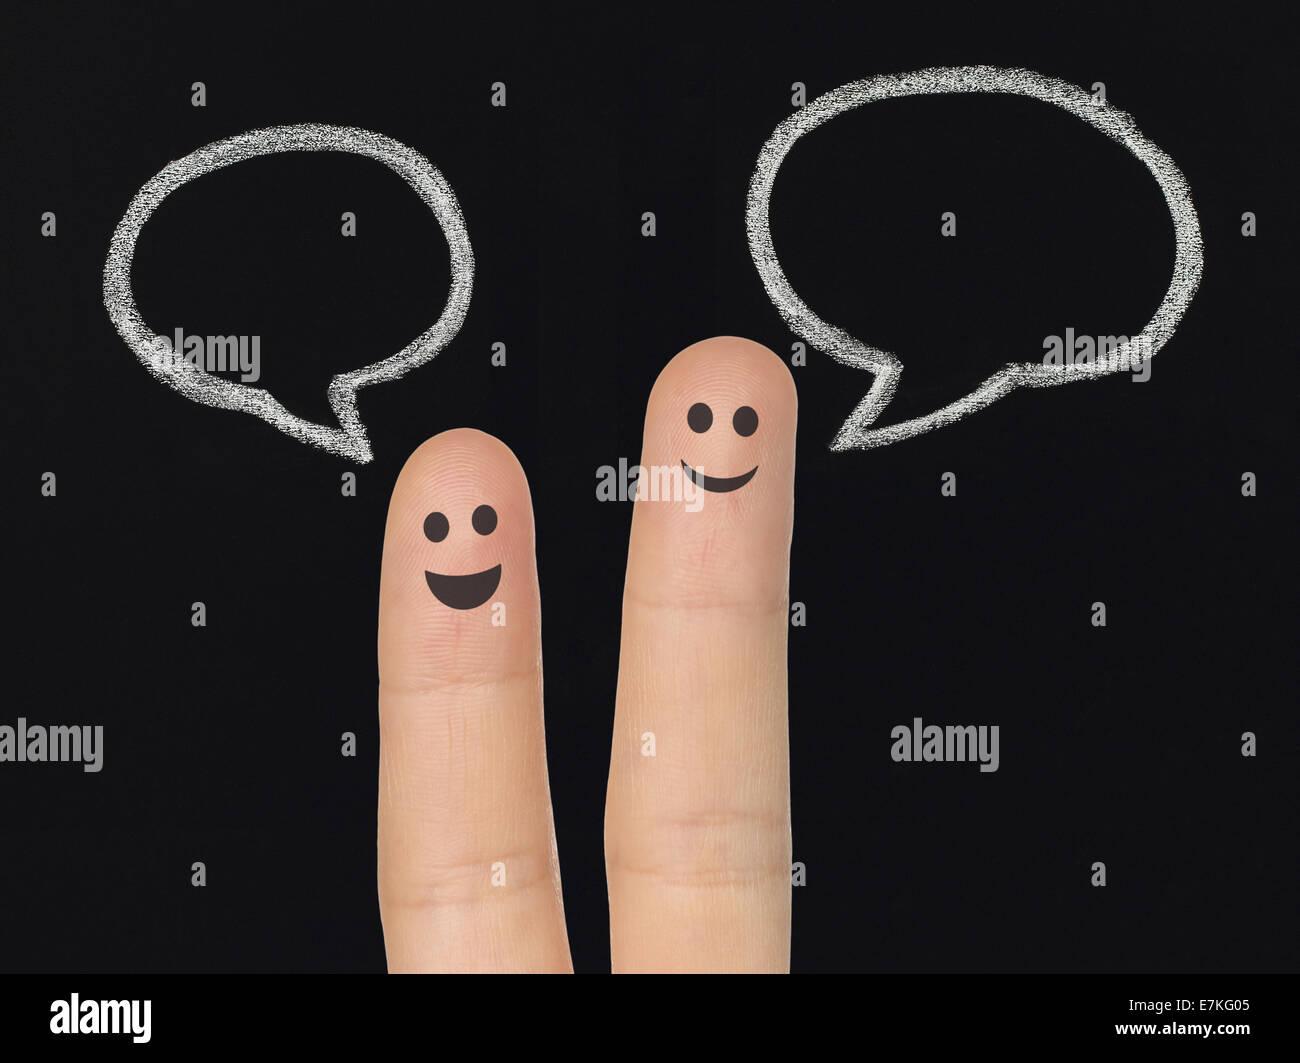 Happy fingers with chalk speech bubbles on blackboard, social media concept - Stock Image